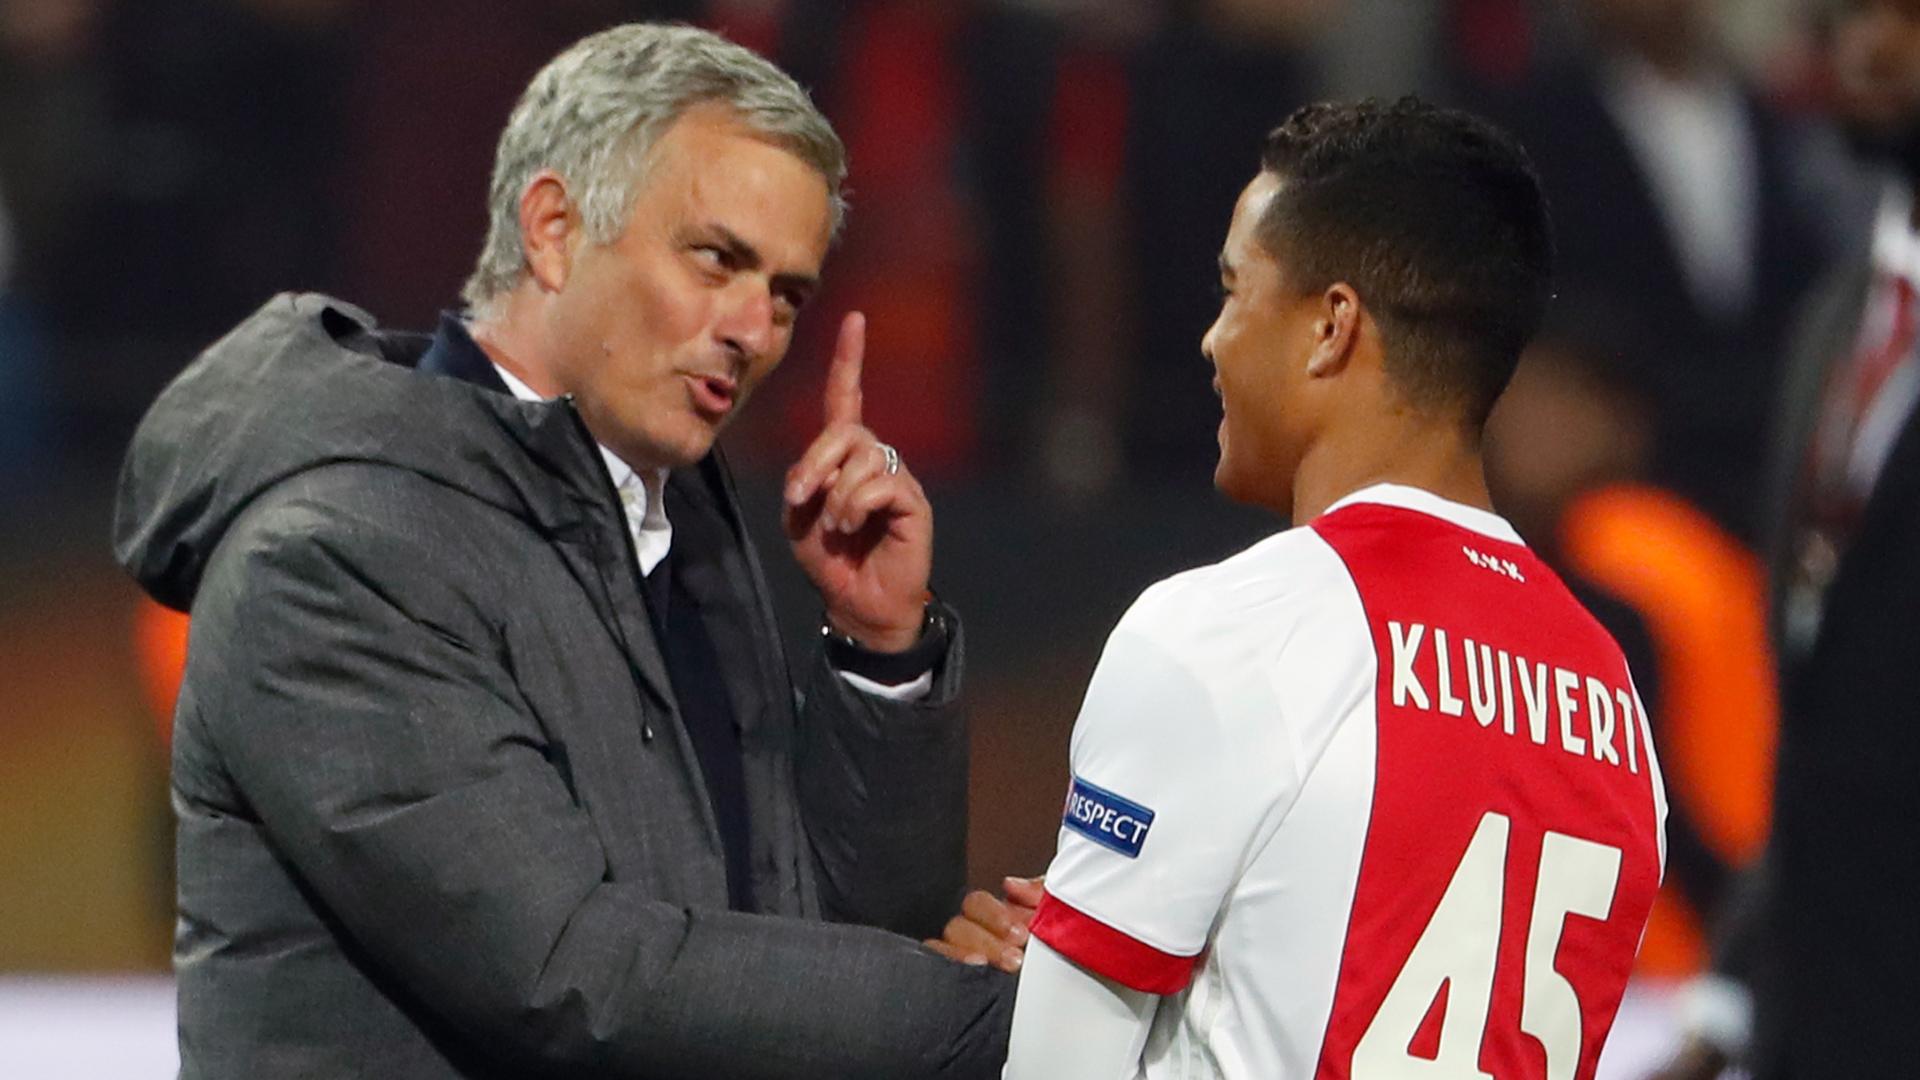 Jose Mourinho Justin Kluivert Manchester United Ajax Amsterdam 24052017